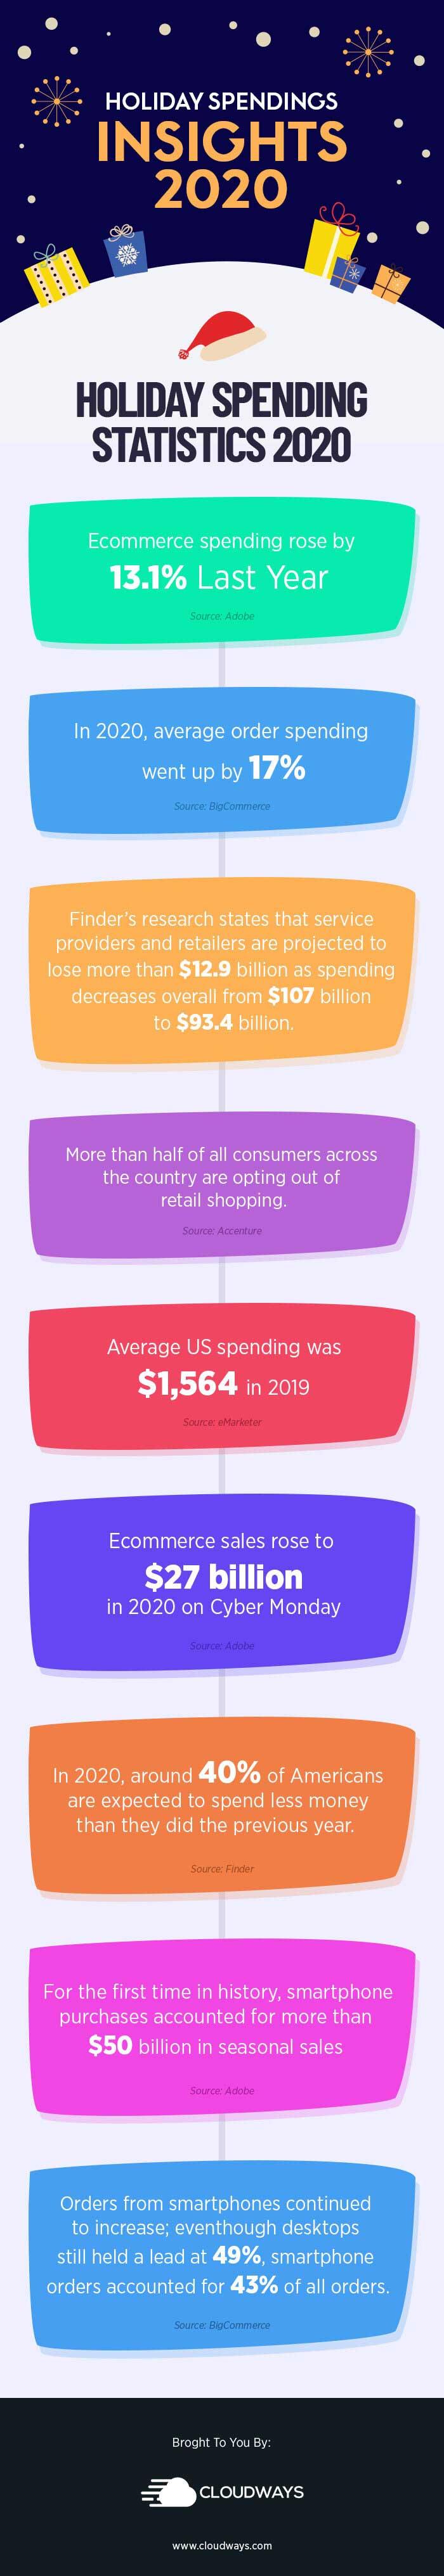 Holiday Spending Statistics 2020